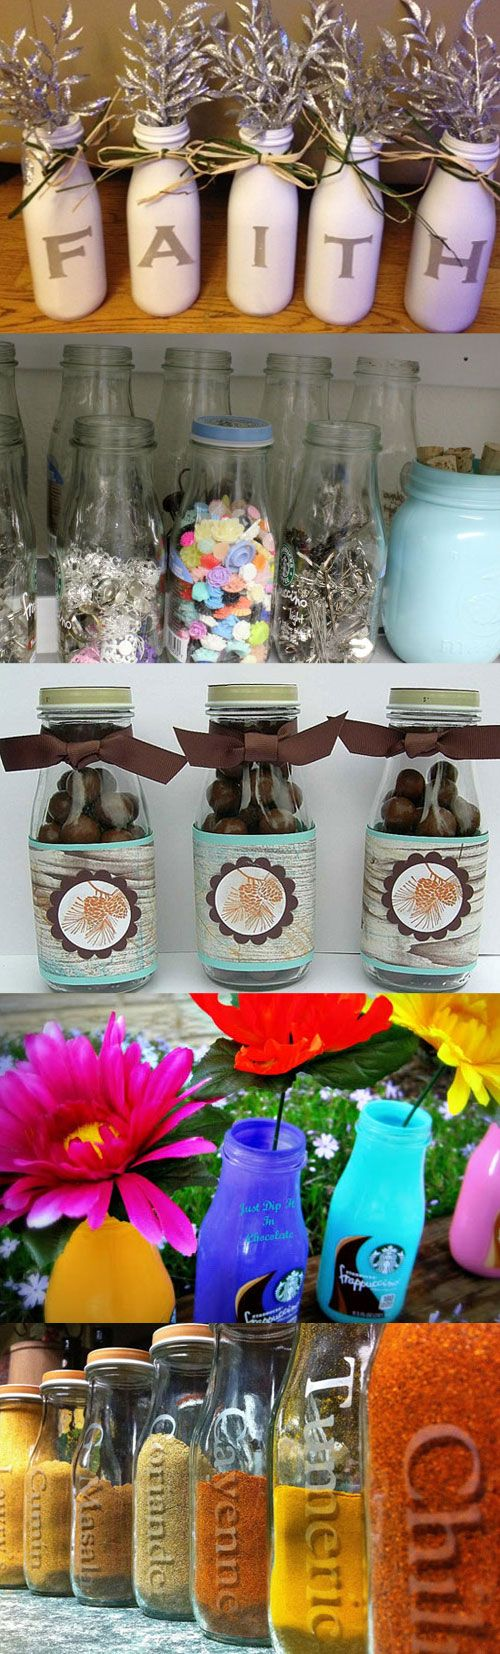 Ideas for reusing frappuccino bottles - Mommy Scene